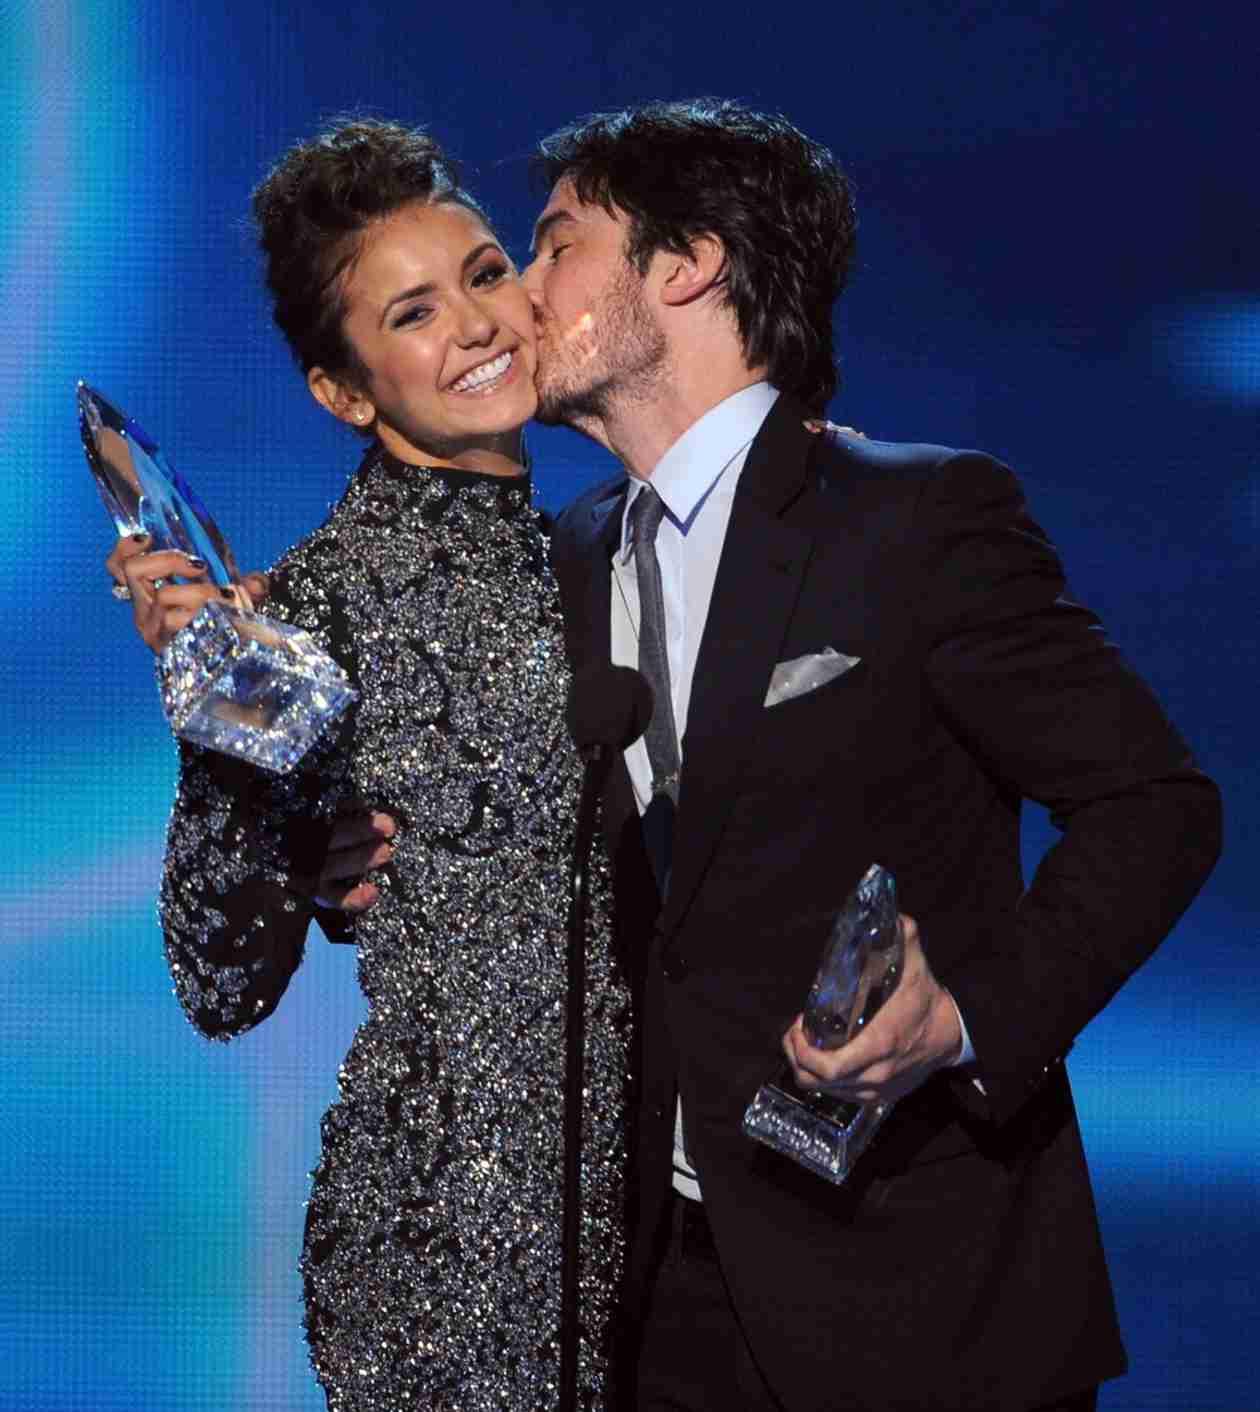 Ian Somerhalder Kisses Nina Dobrev's Cheek After People's Choice Award Win! (PHOTO)